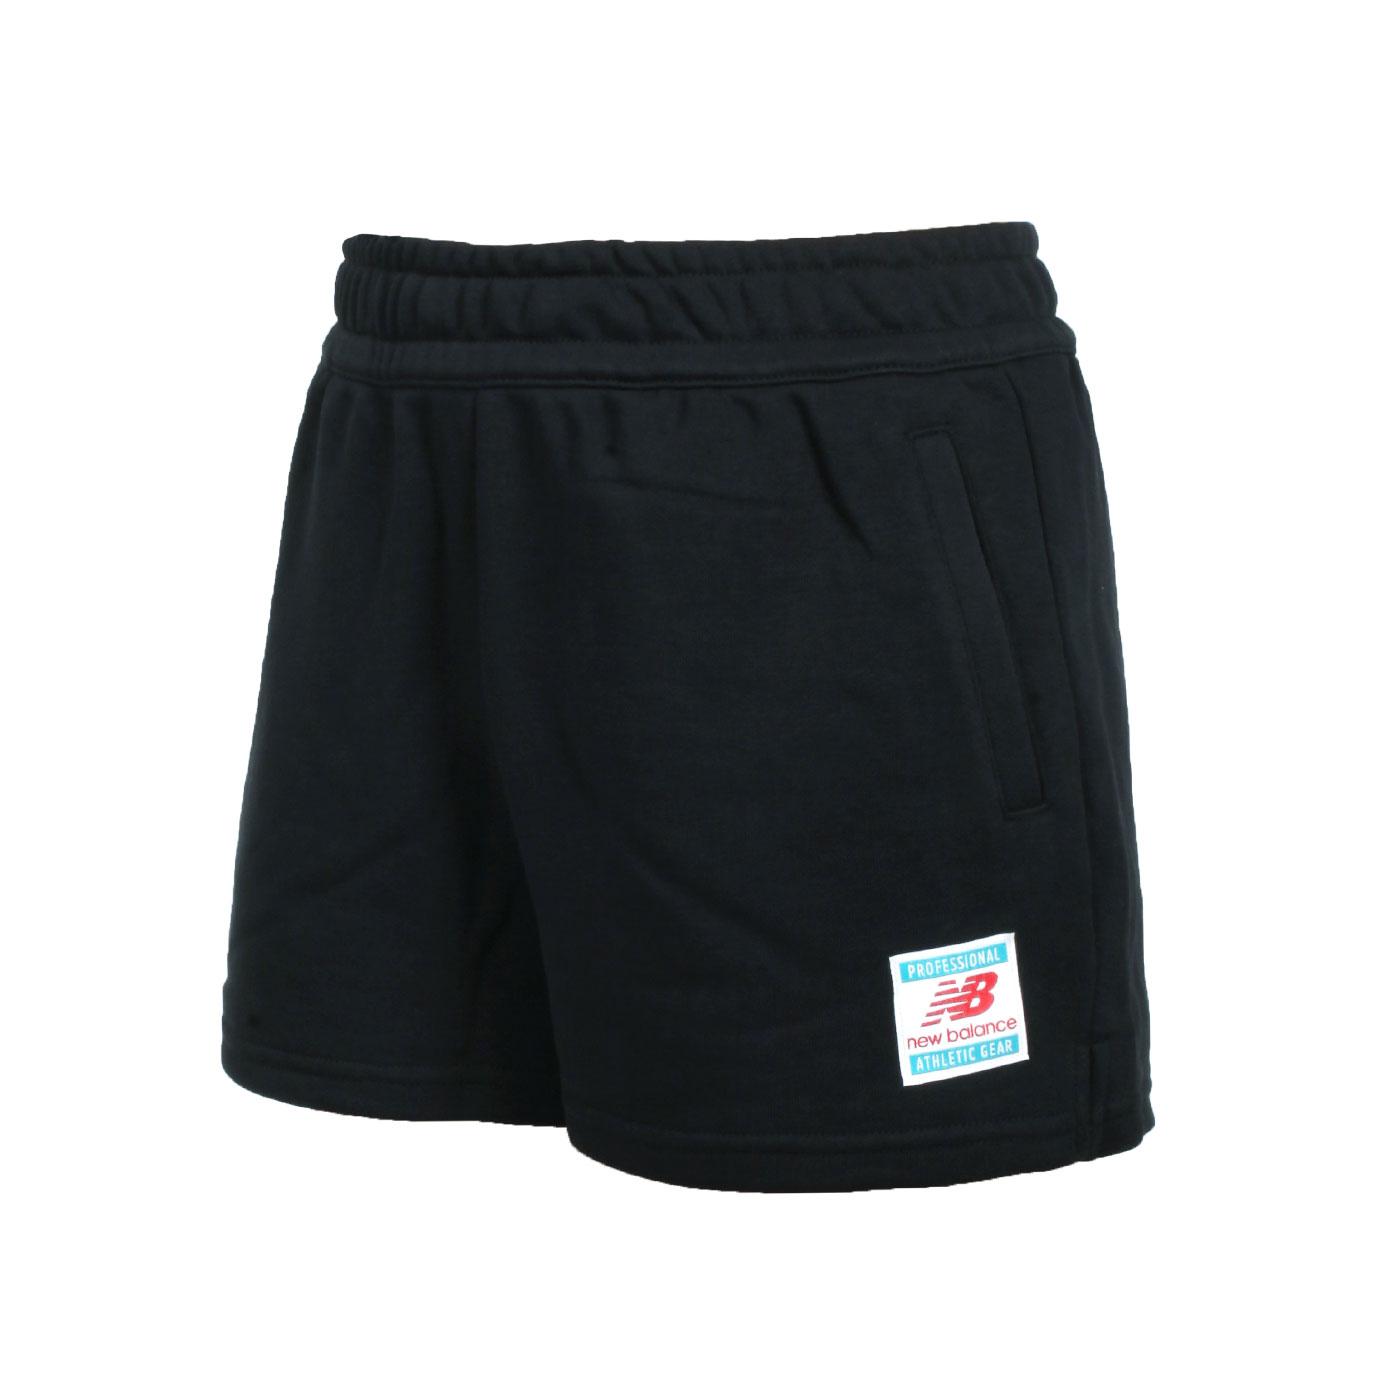 NEW BALANCE 女款左腿標籤棉短褲 WS11504BK - 黑白紅藍